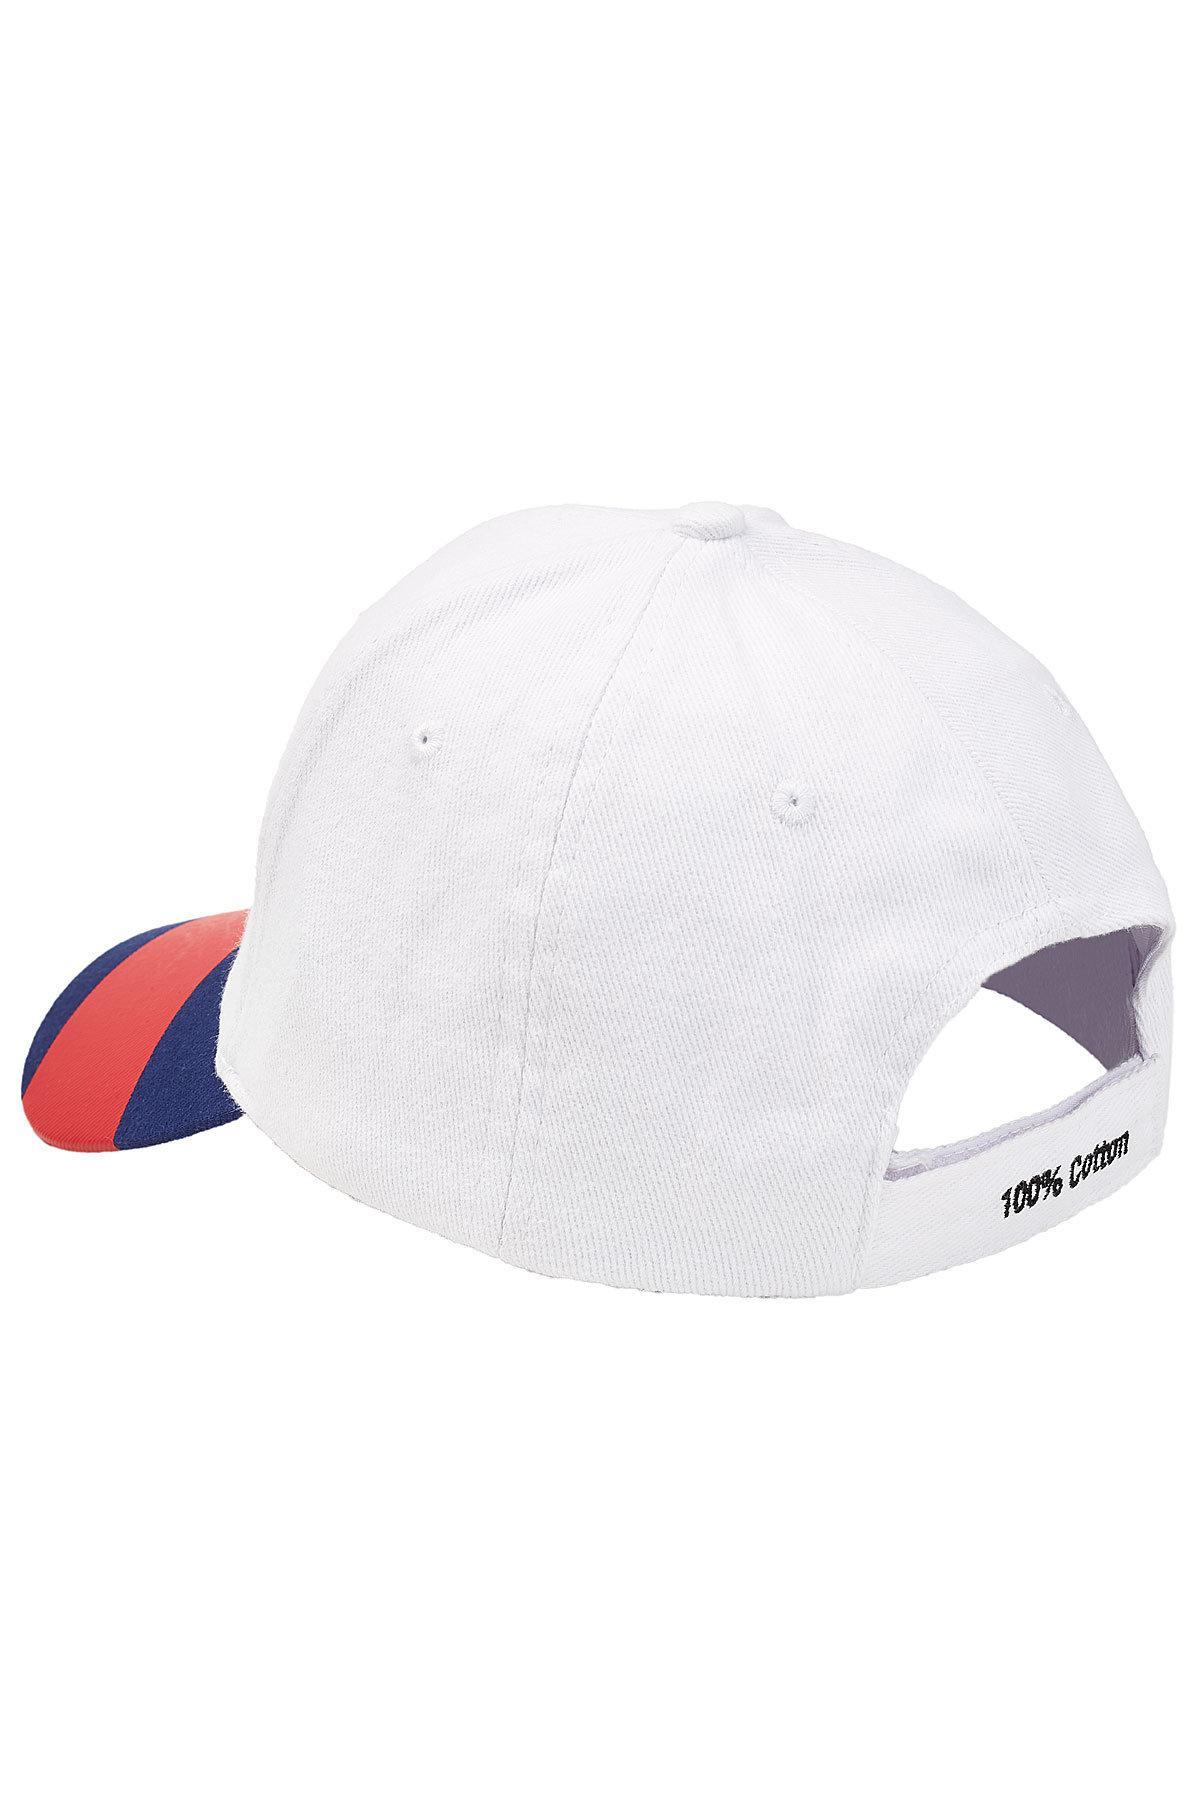 Lyst - Vetements X Tommy Hilfiger Cotton Baseball Cap for Men 1089c645b72a